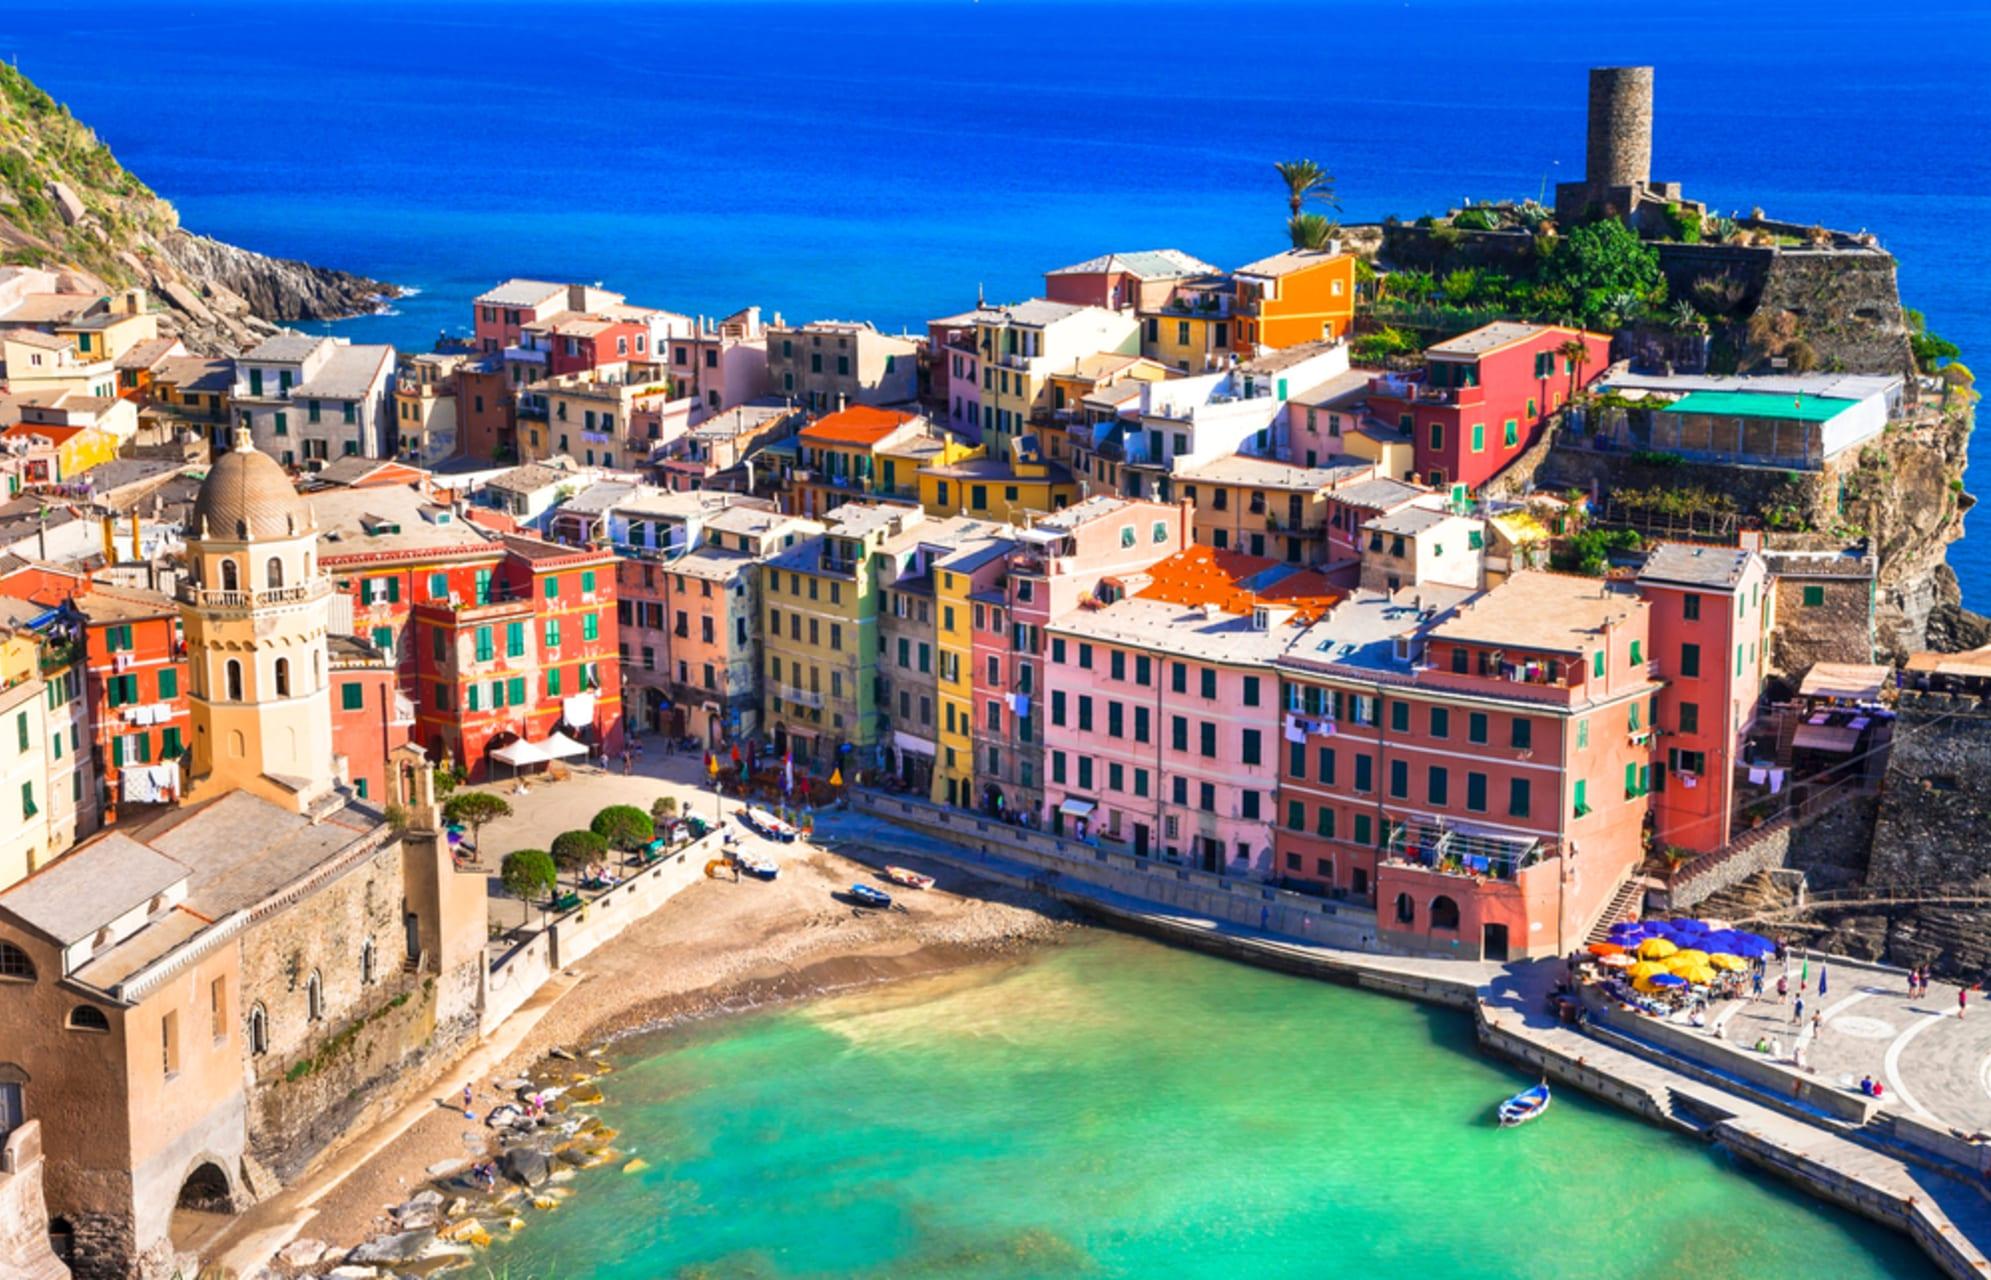 Cinque Terre & Portovenere - Vernazza - the bay of lovers and pirates